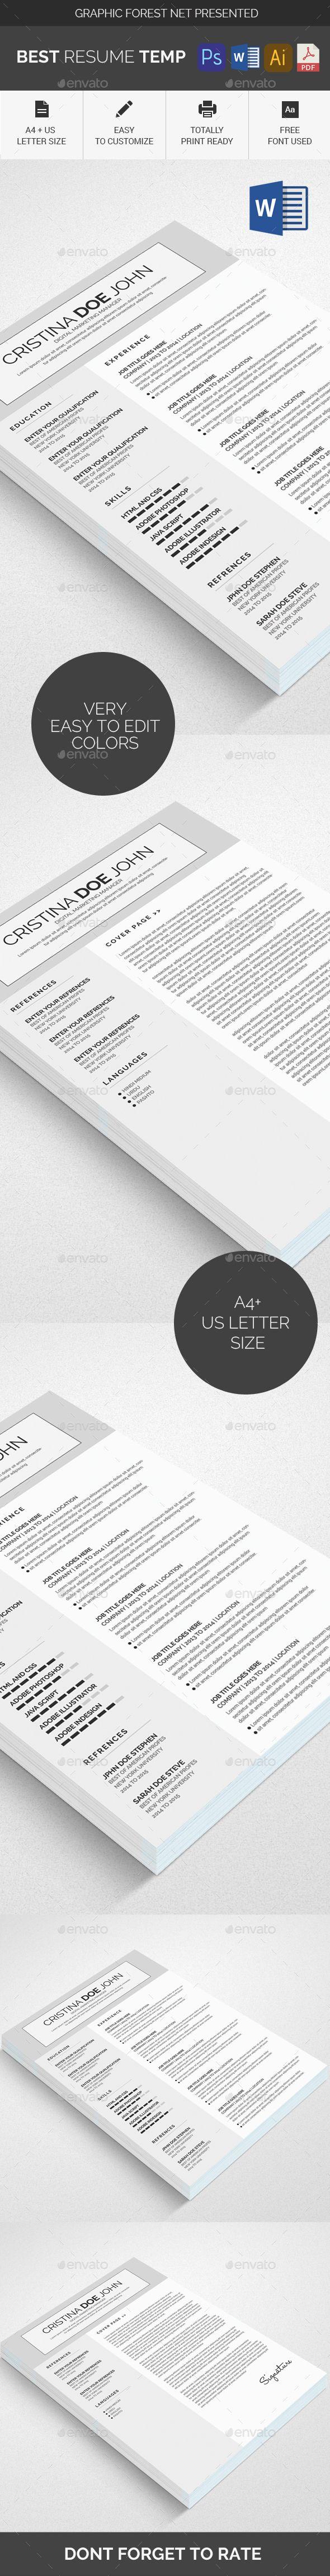 Resume CV Print Template 5126 best RESUME